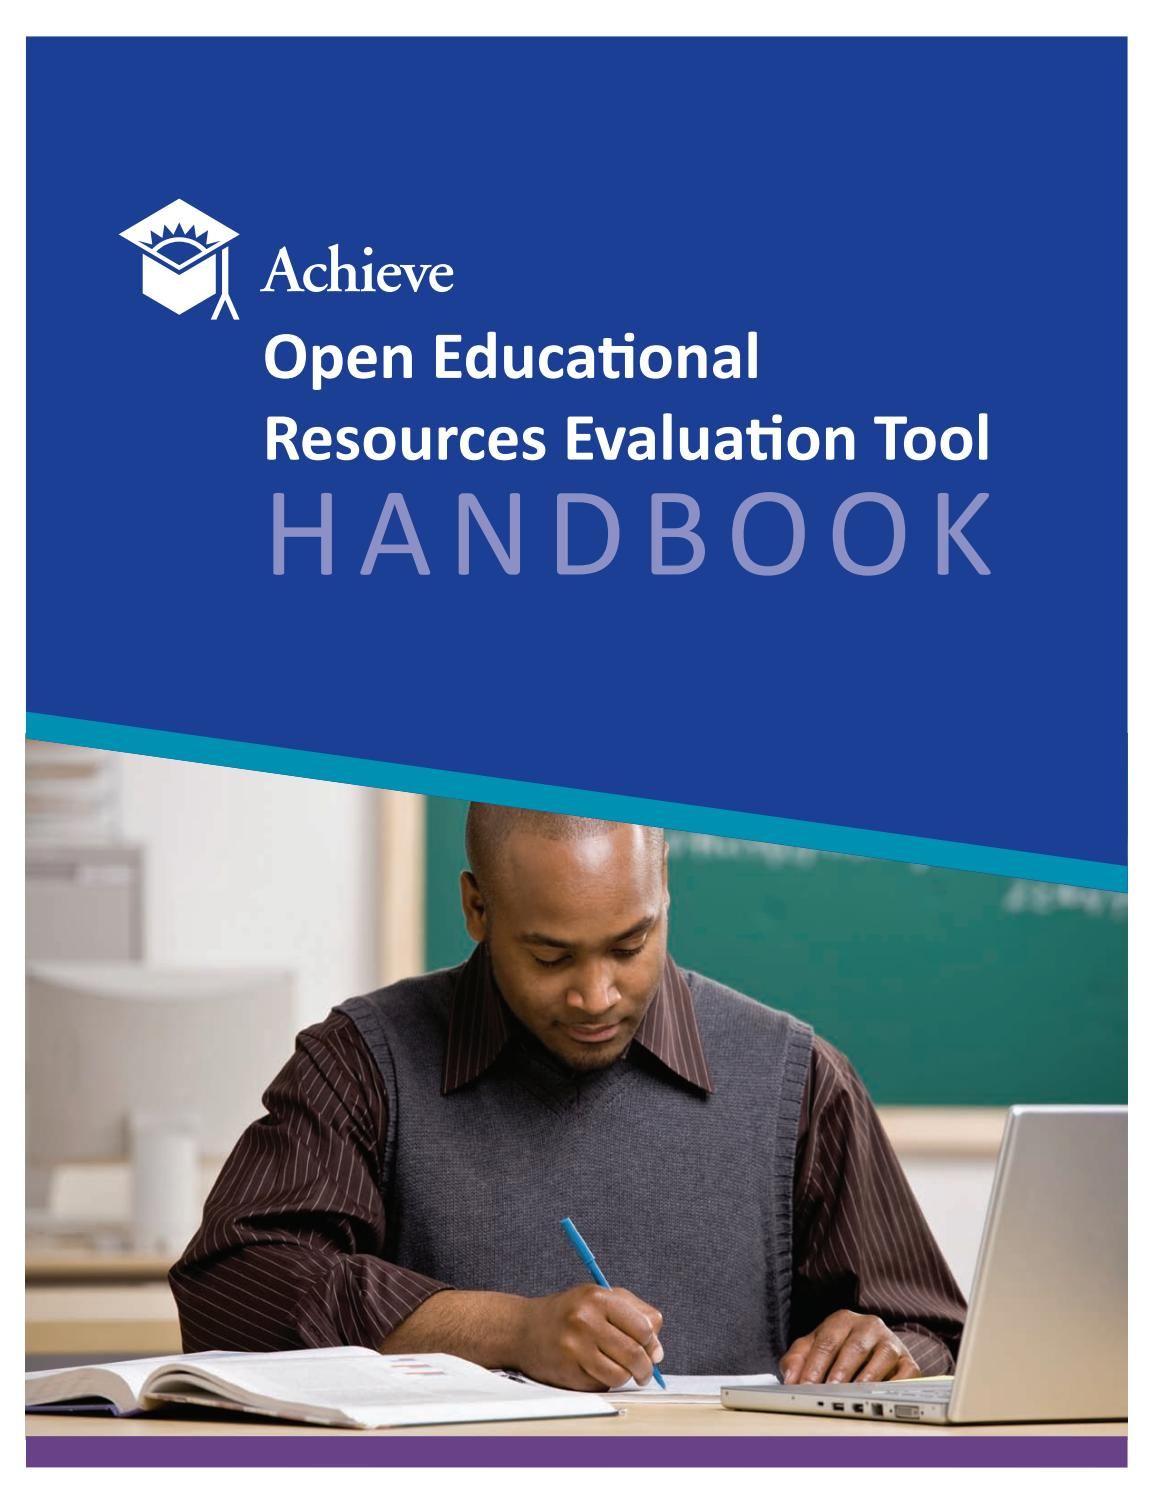 Achieve OER Evaluation Tool Handbook by Achieve, Inc  - issuu